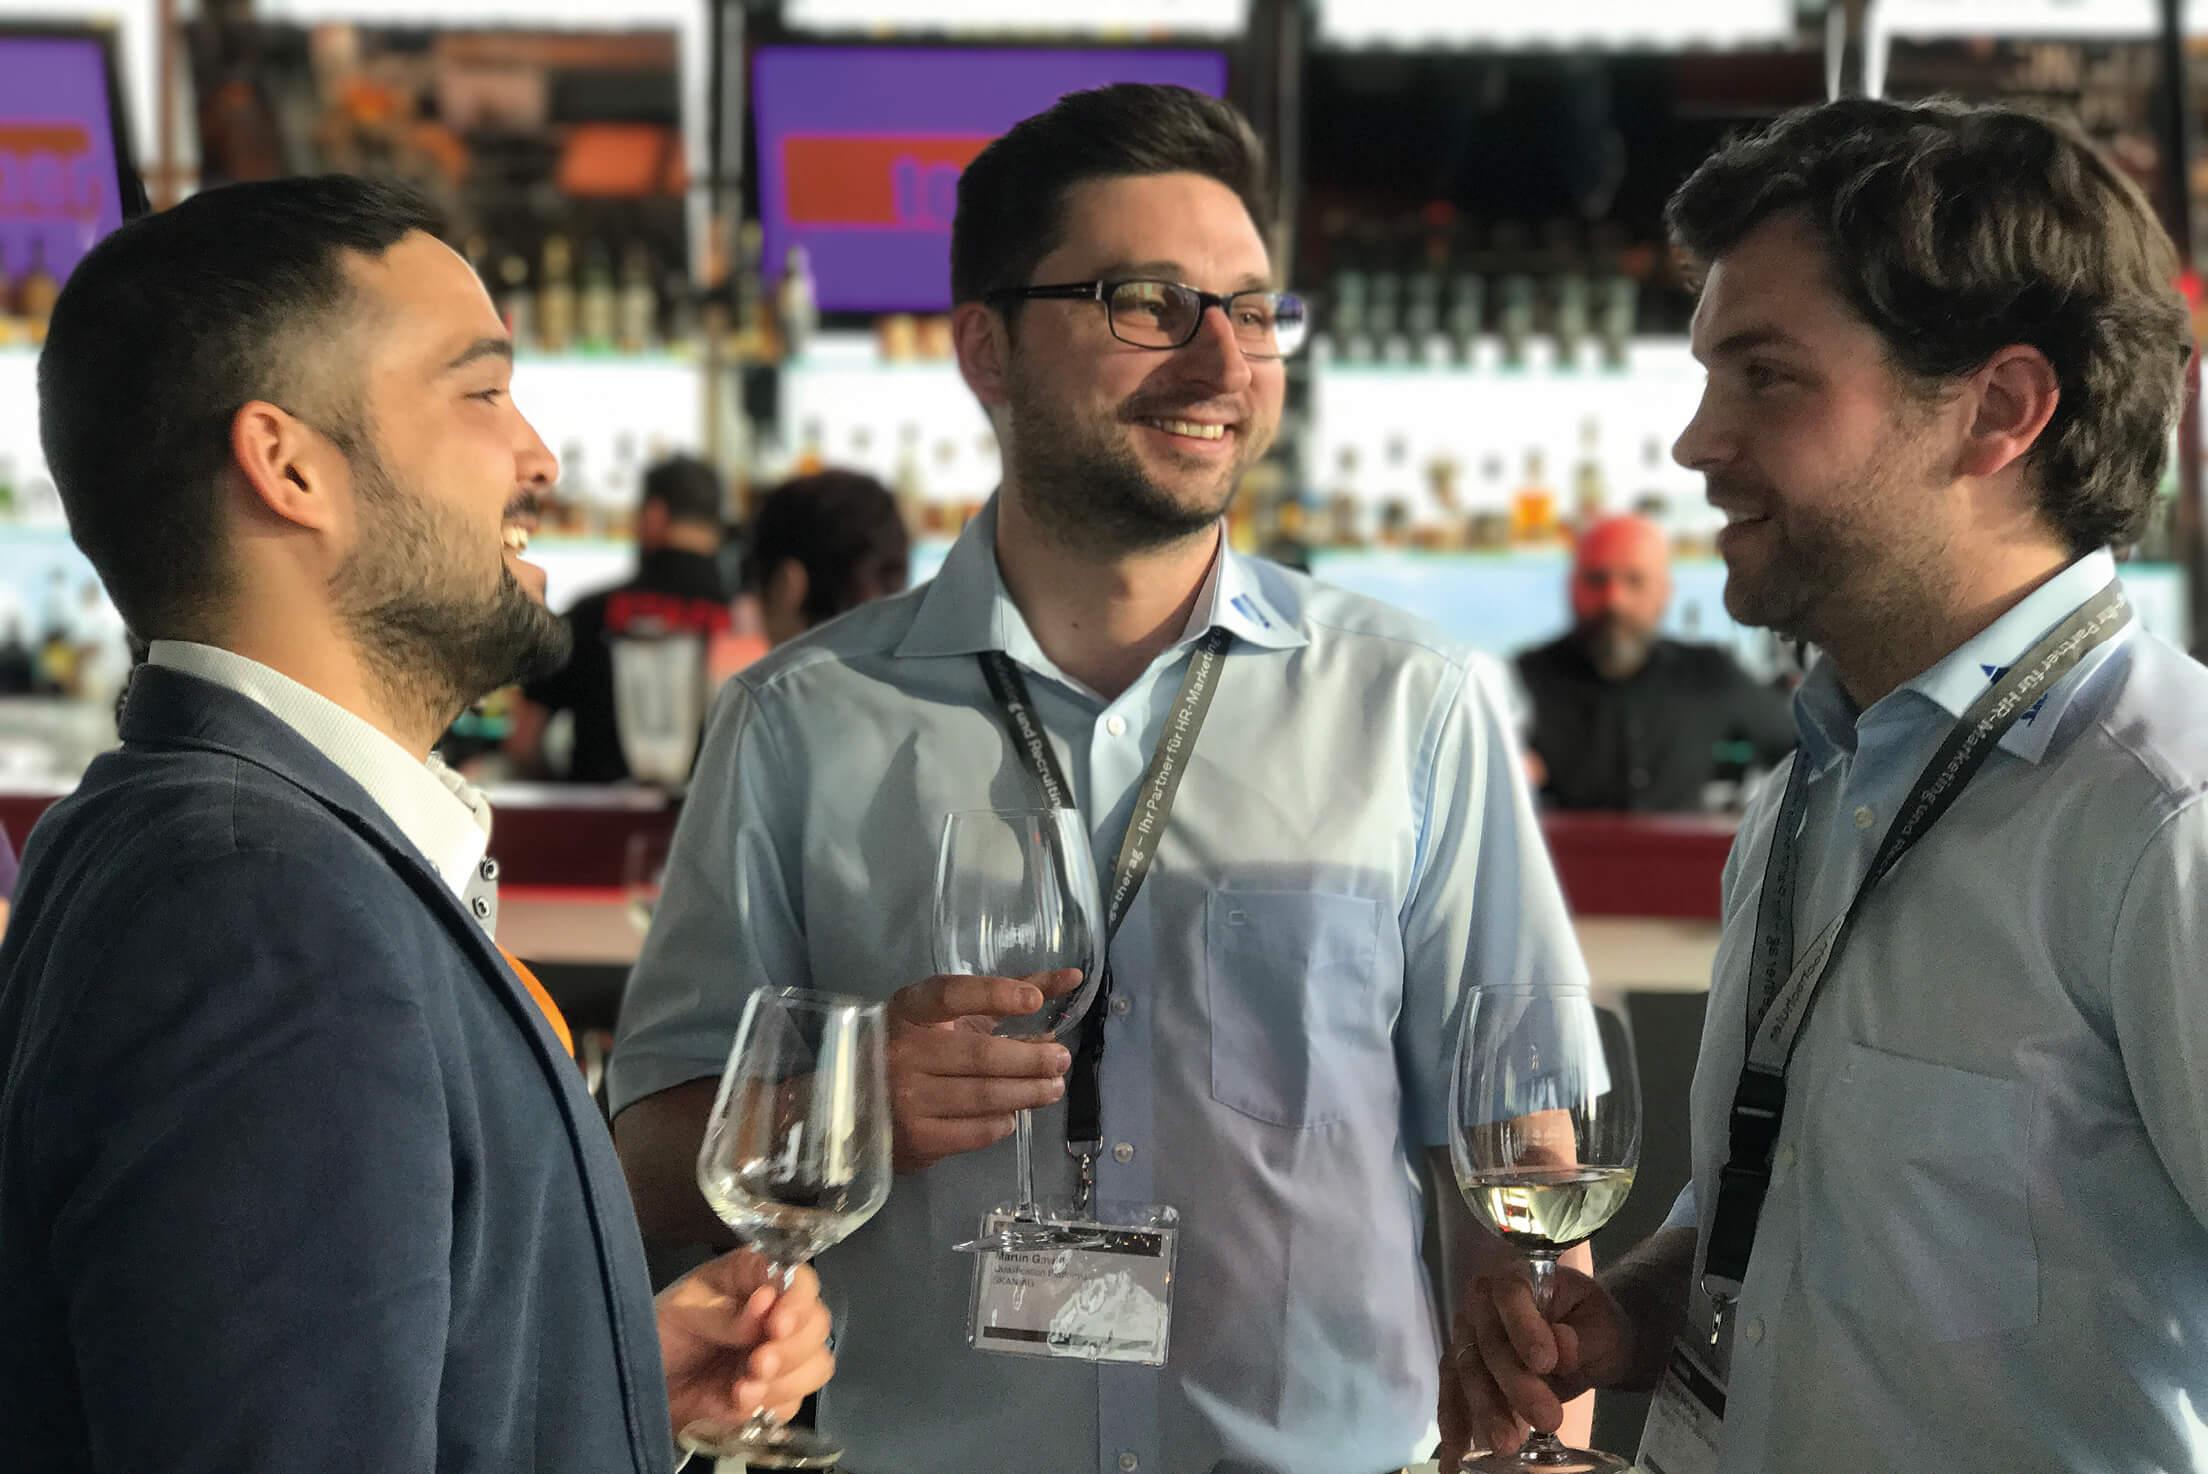 Sprungbrett-Event Basel 2018